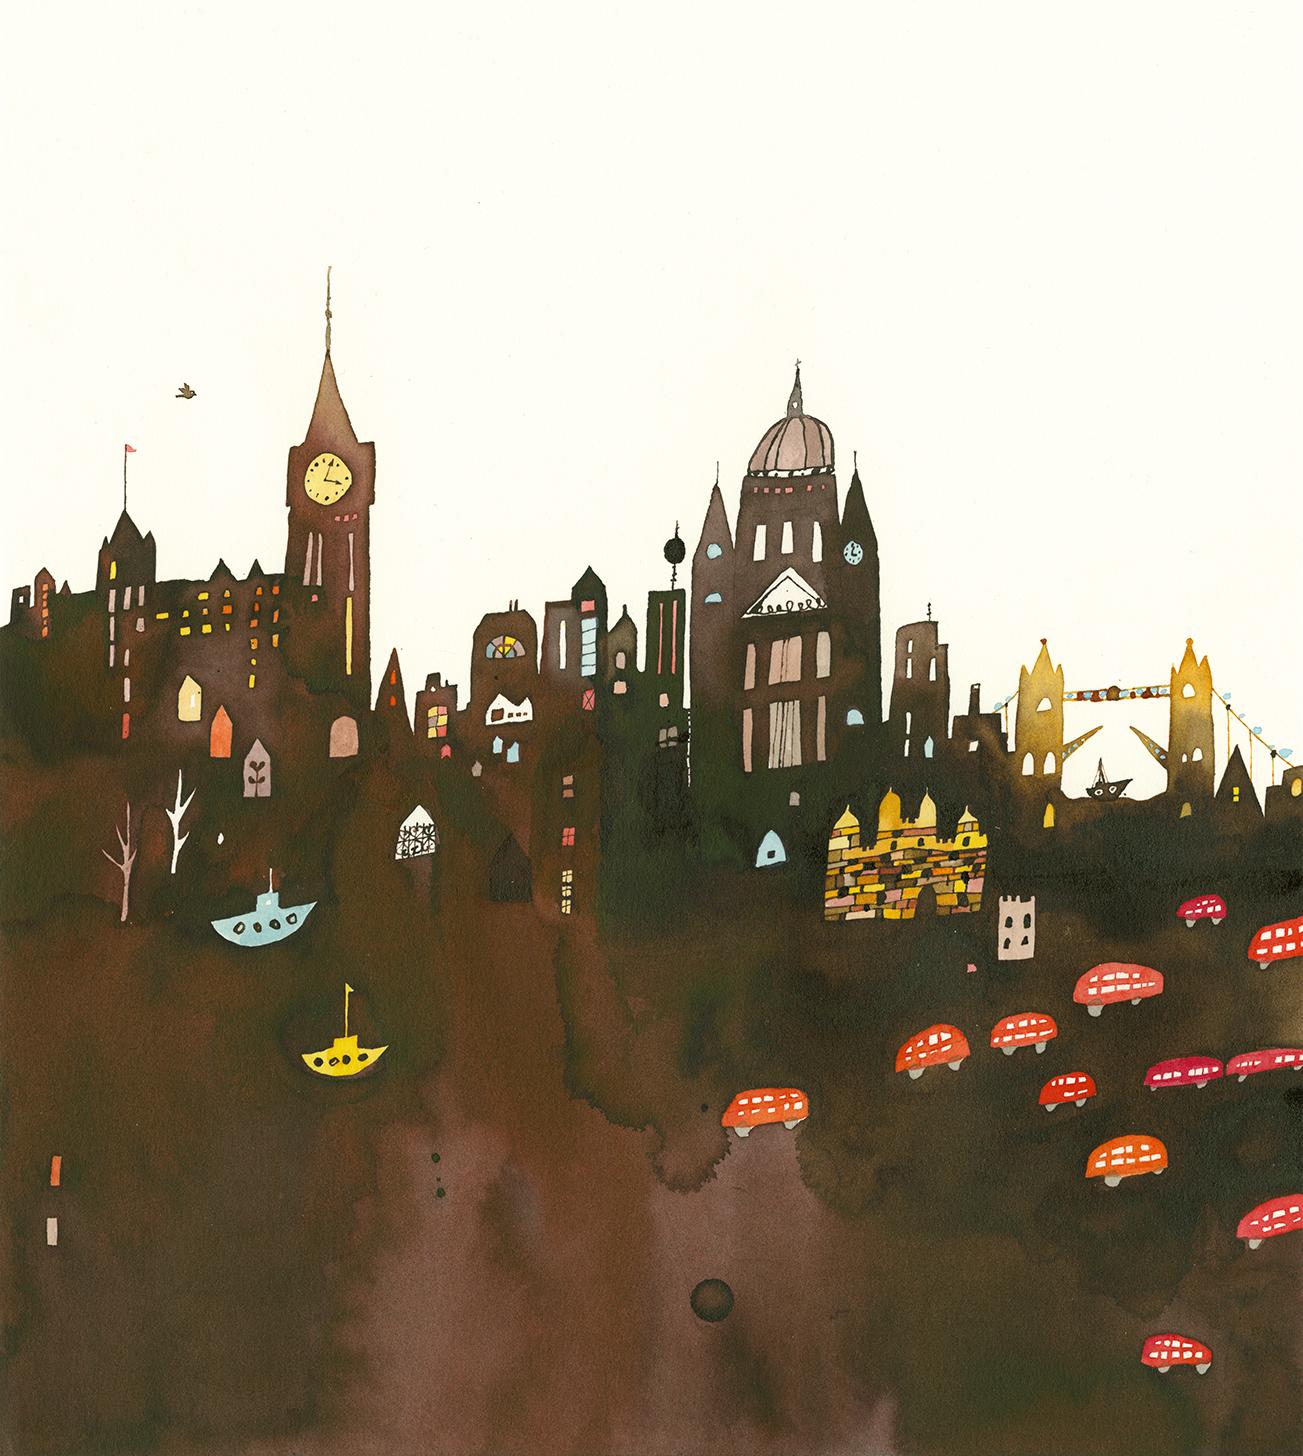 Nomoco's Gentle Illustrations. Pictured here: London, UK.